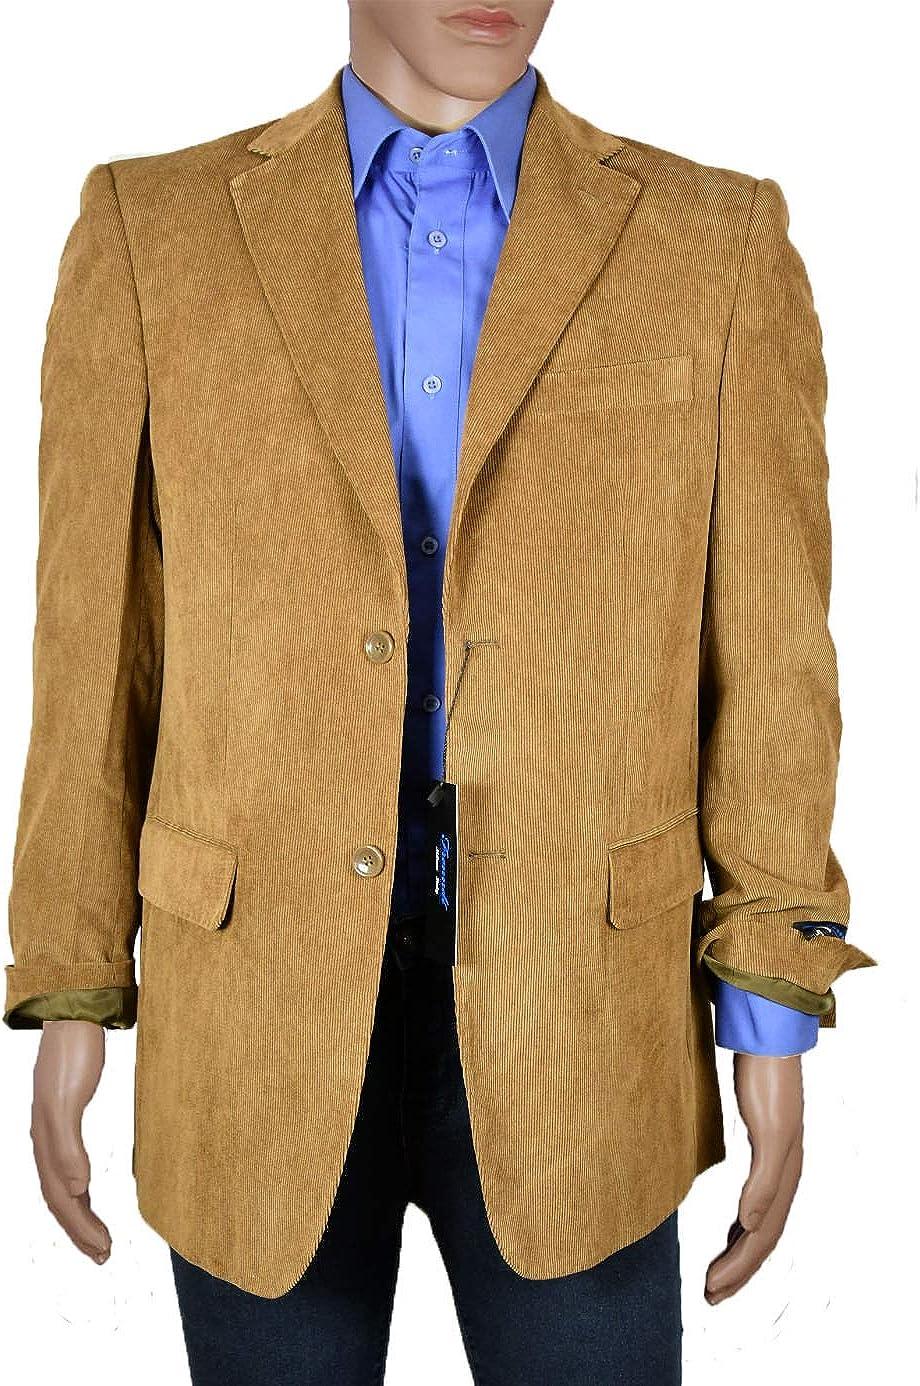 Men's Brown Corduroy Blazer with Half Price